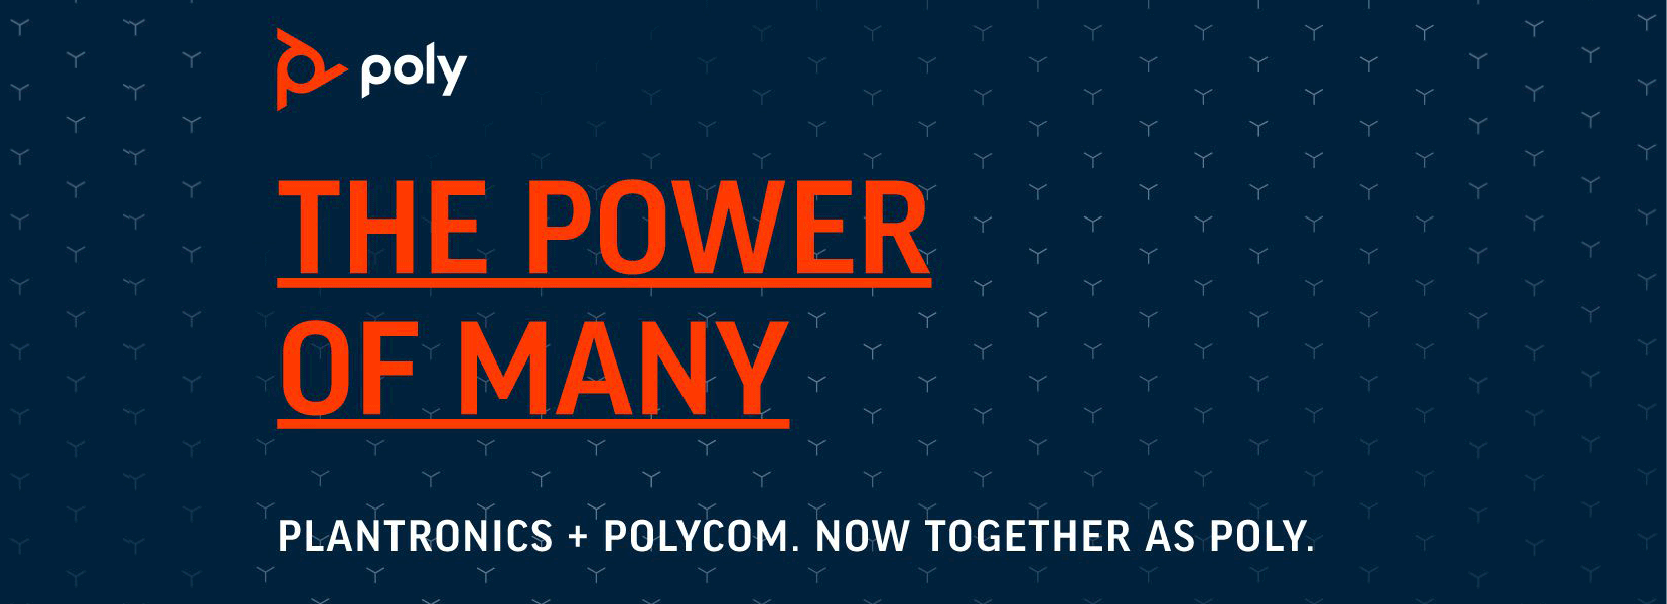 Polycom and Plantronics